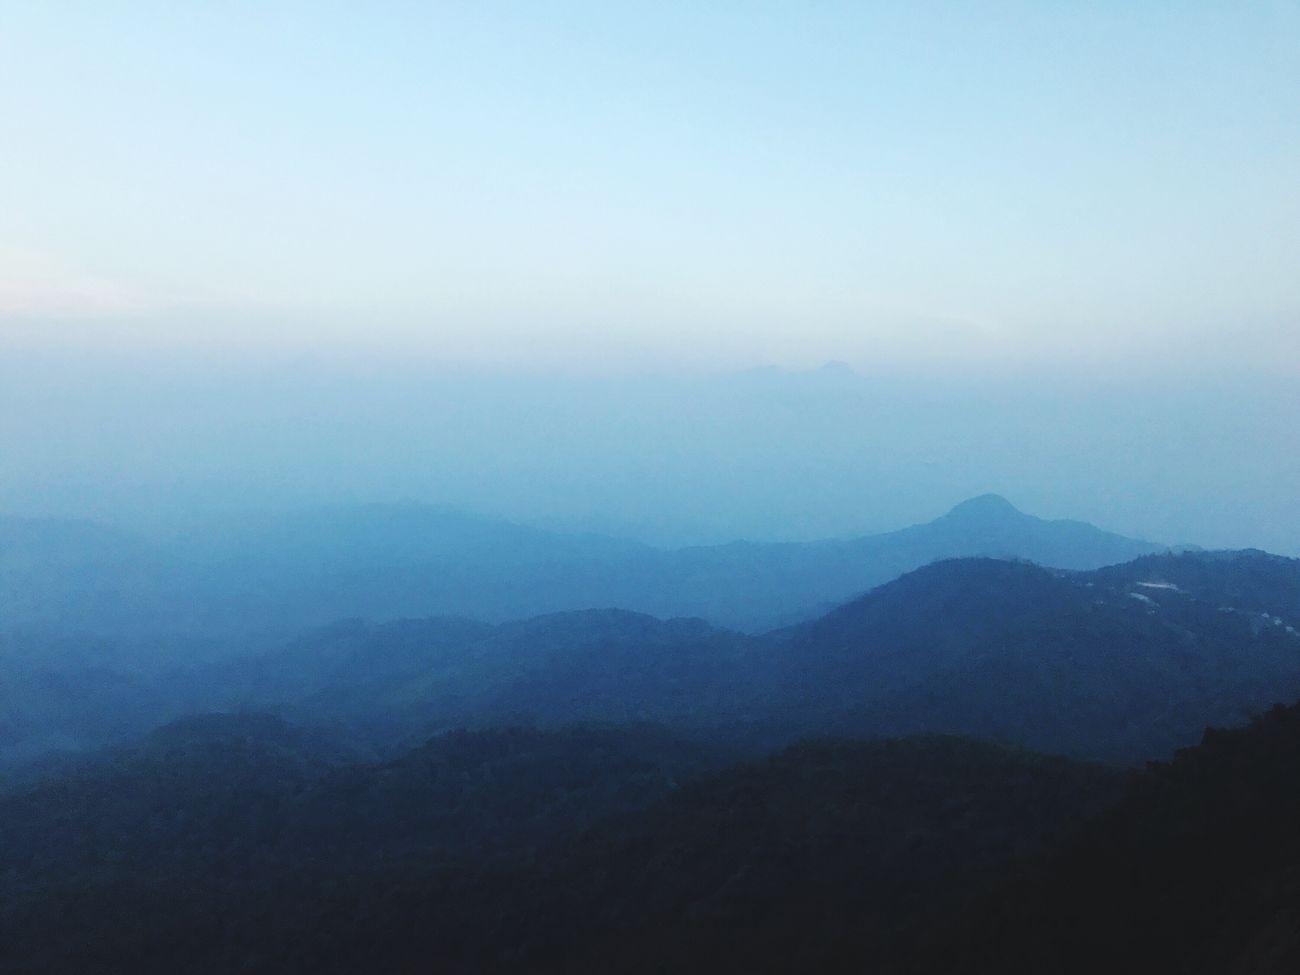 Hills Kayin State, Burma. Foggy Weather